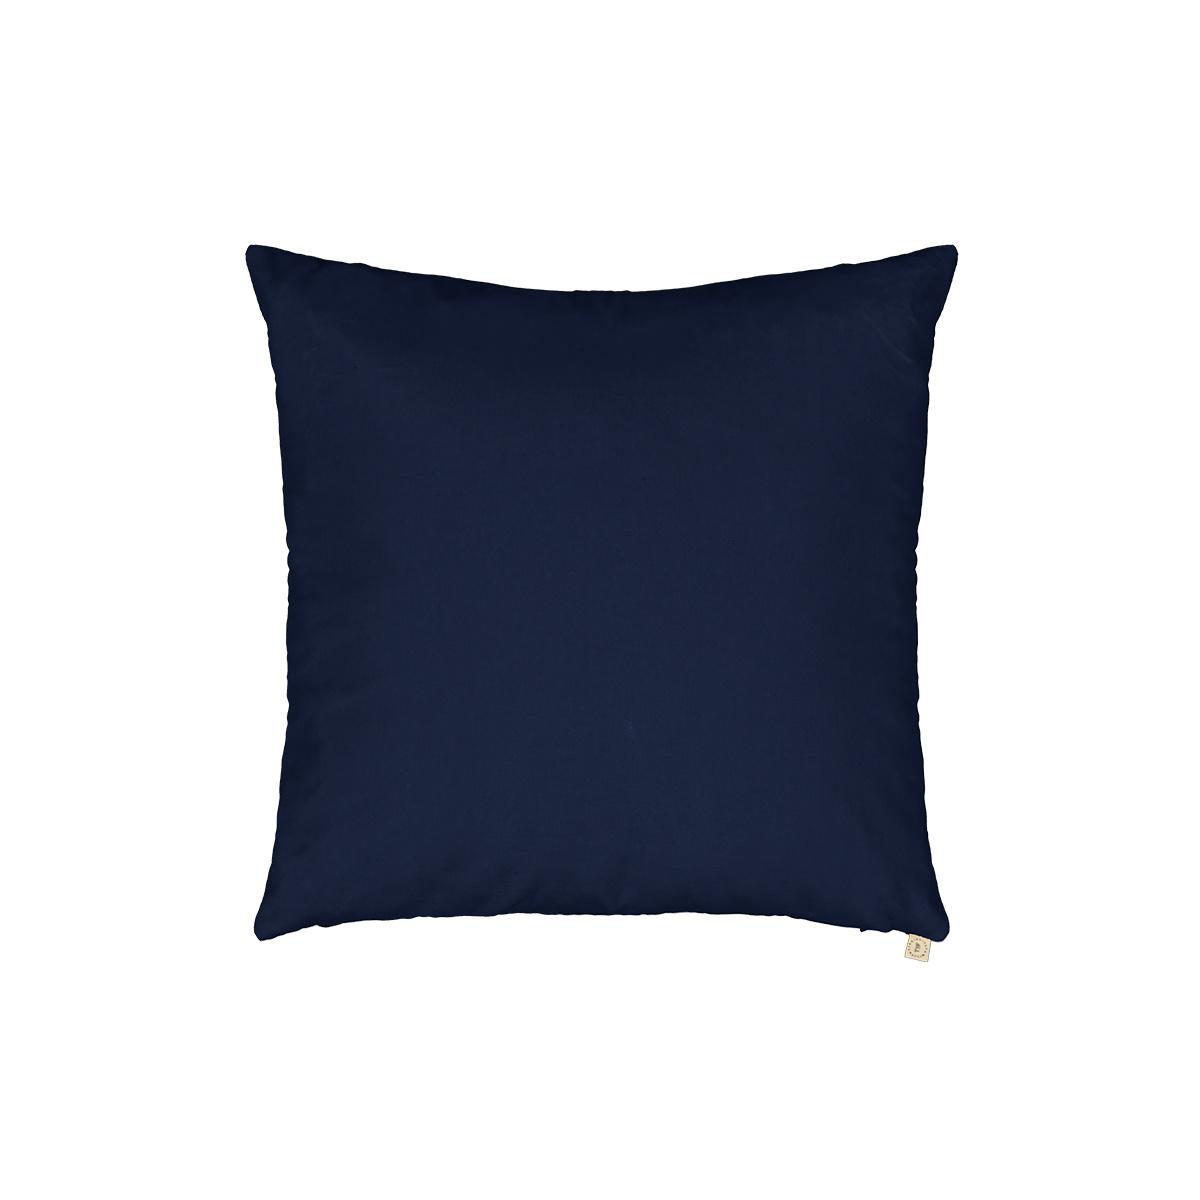 Coussin Carino velours bleu marine